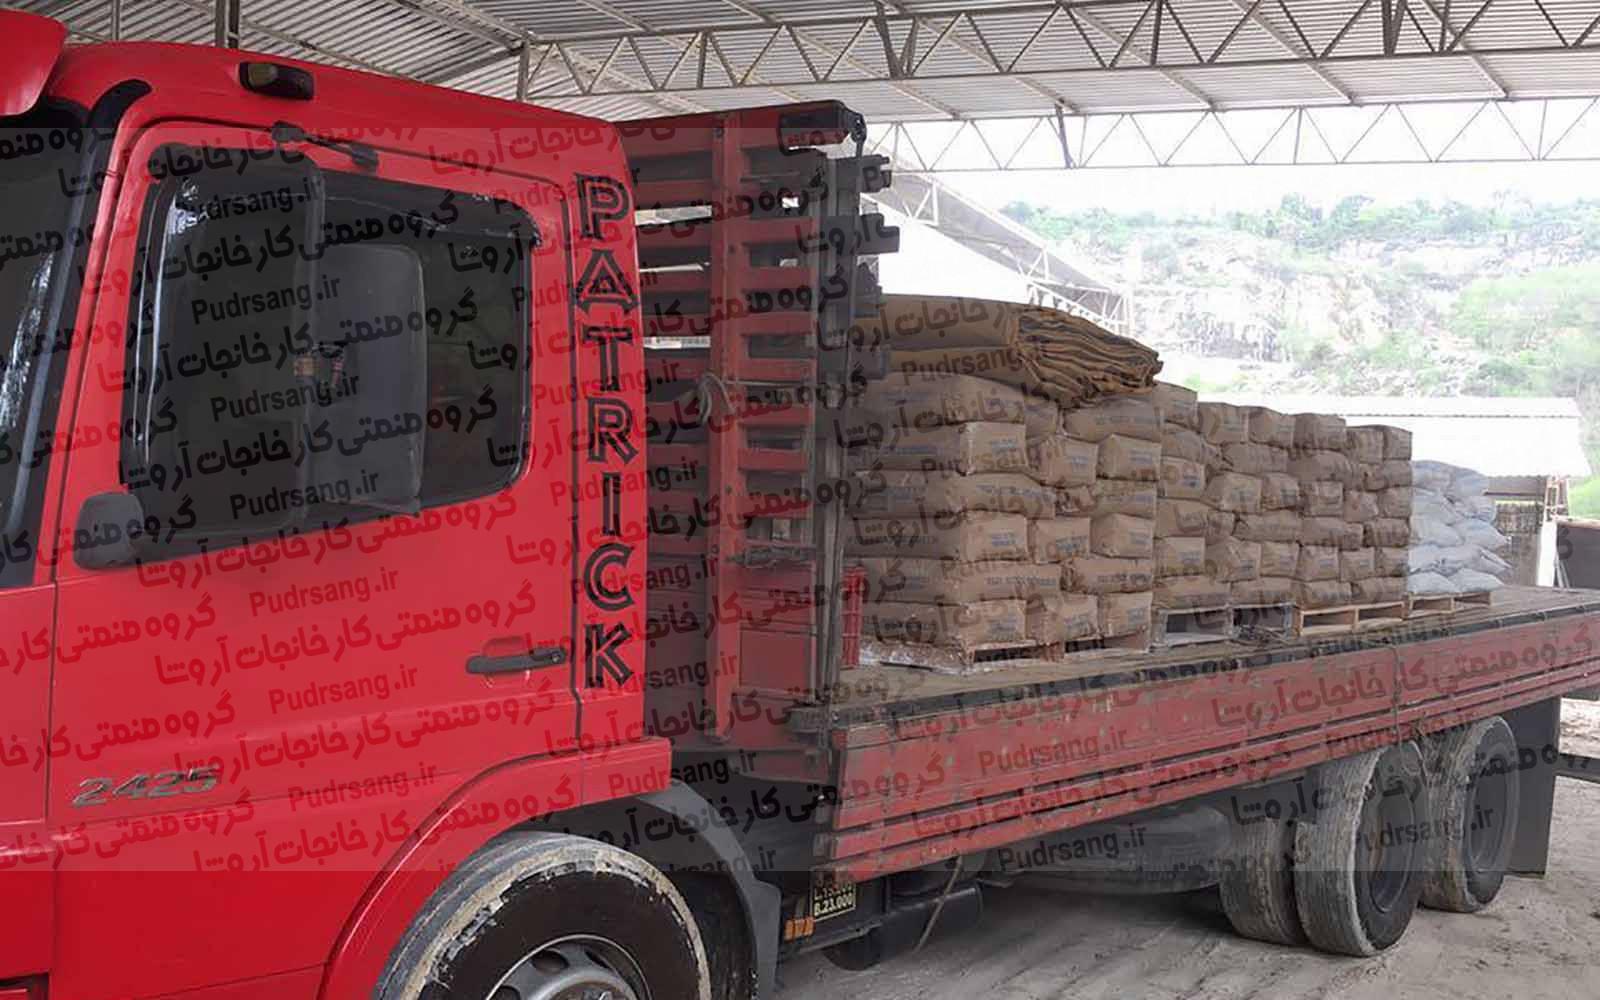 فروش پودر میکرونیزه کربنات کلسیم به قیمت درب کارخانه